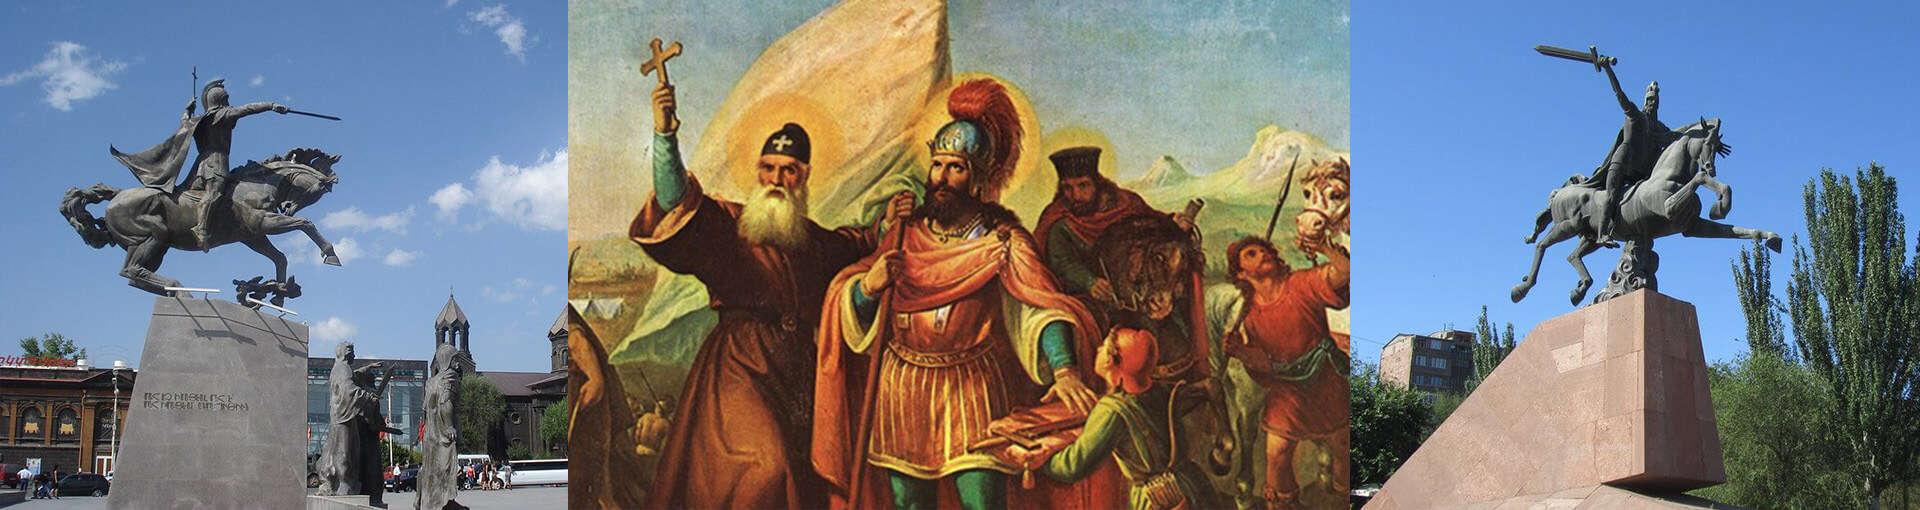 Vardan Mamikonyan - The hero of Avarayr Battle